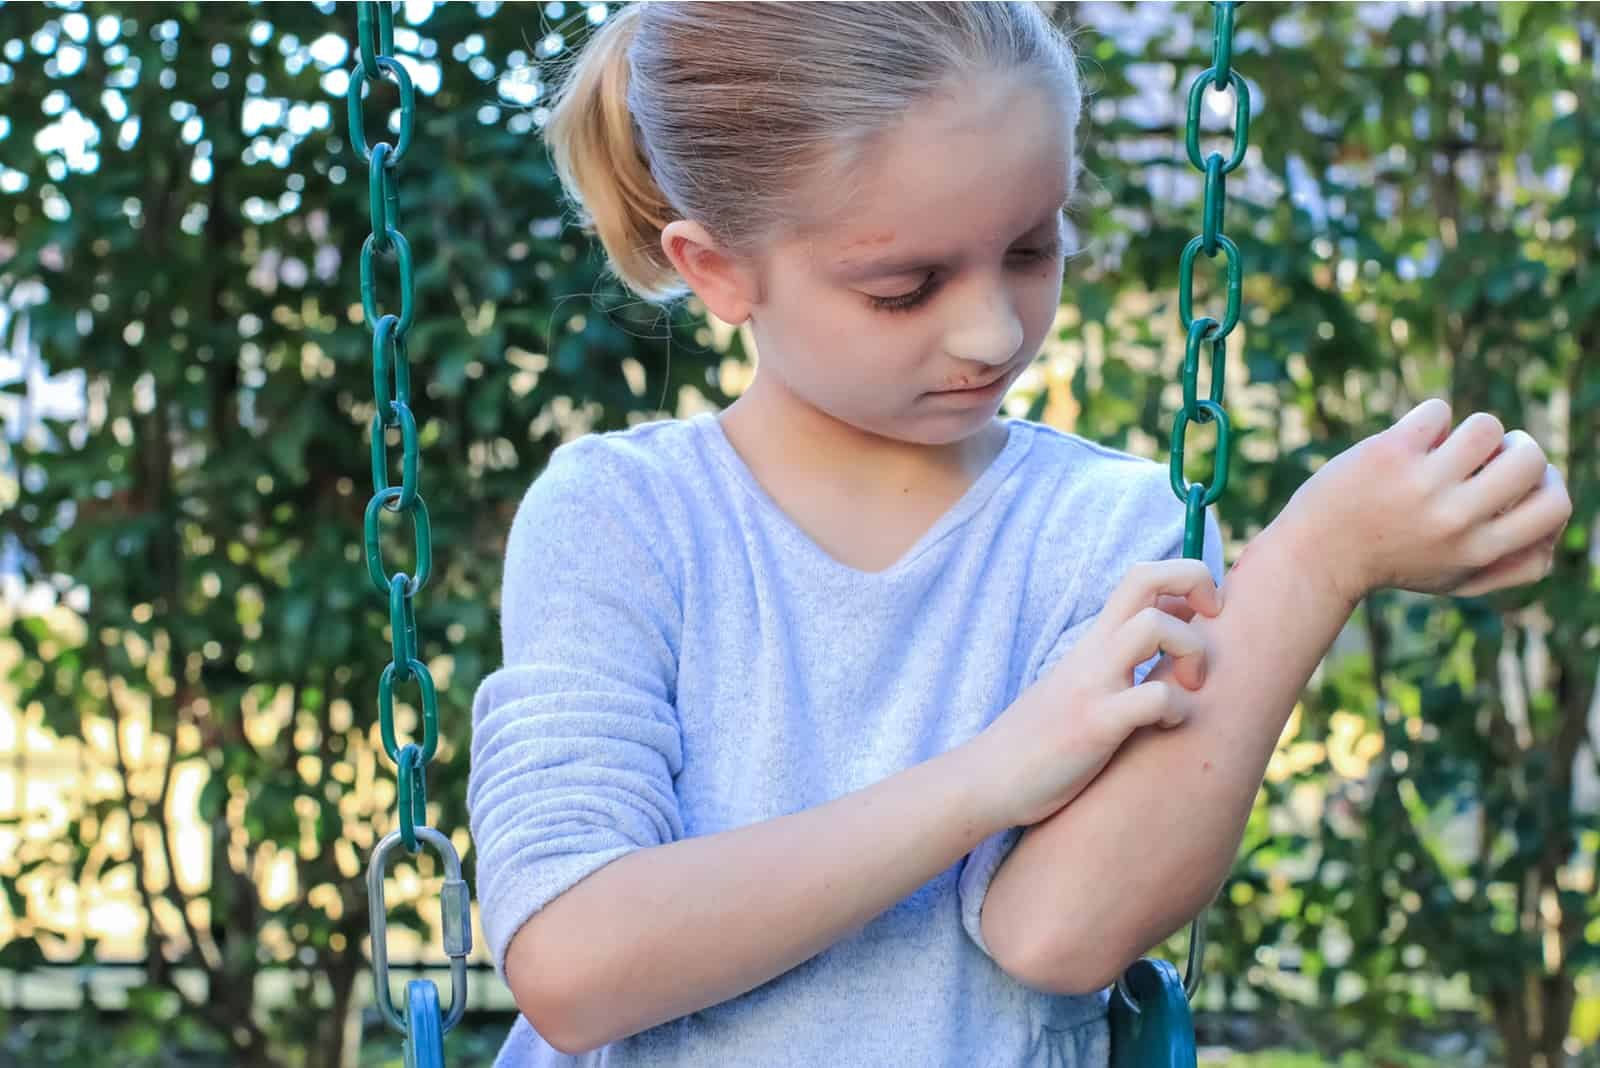 atopische Dermatitis an den Armen sichtbar